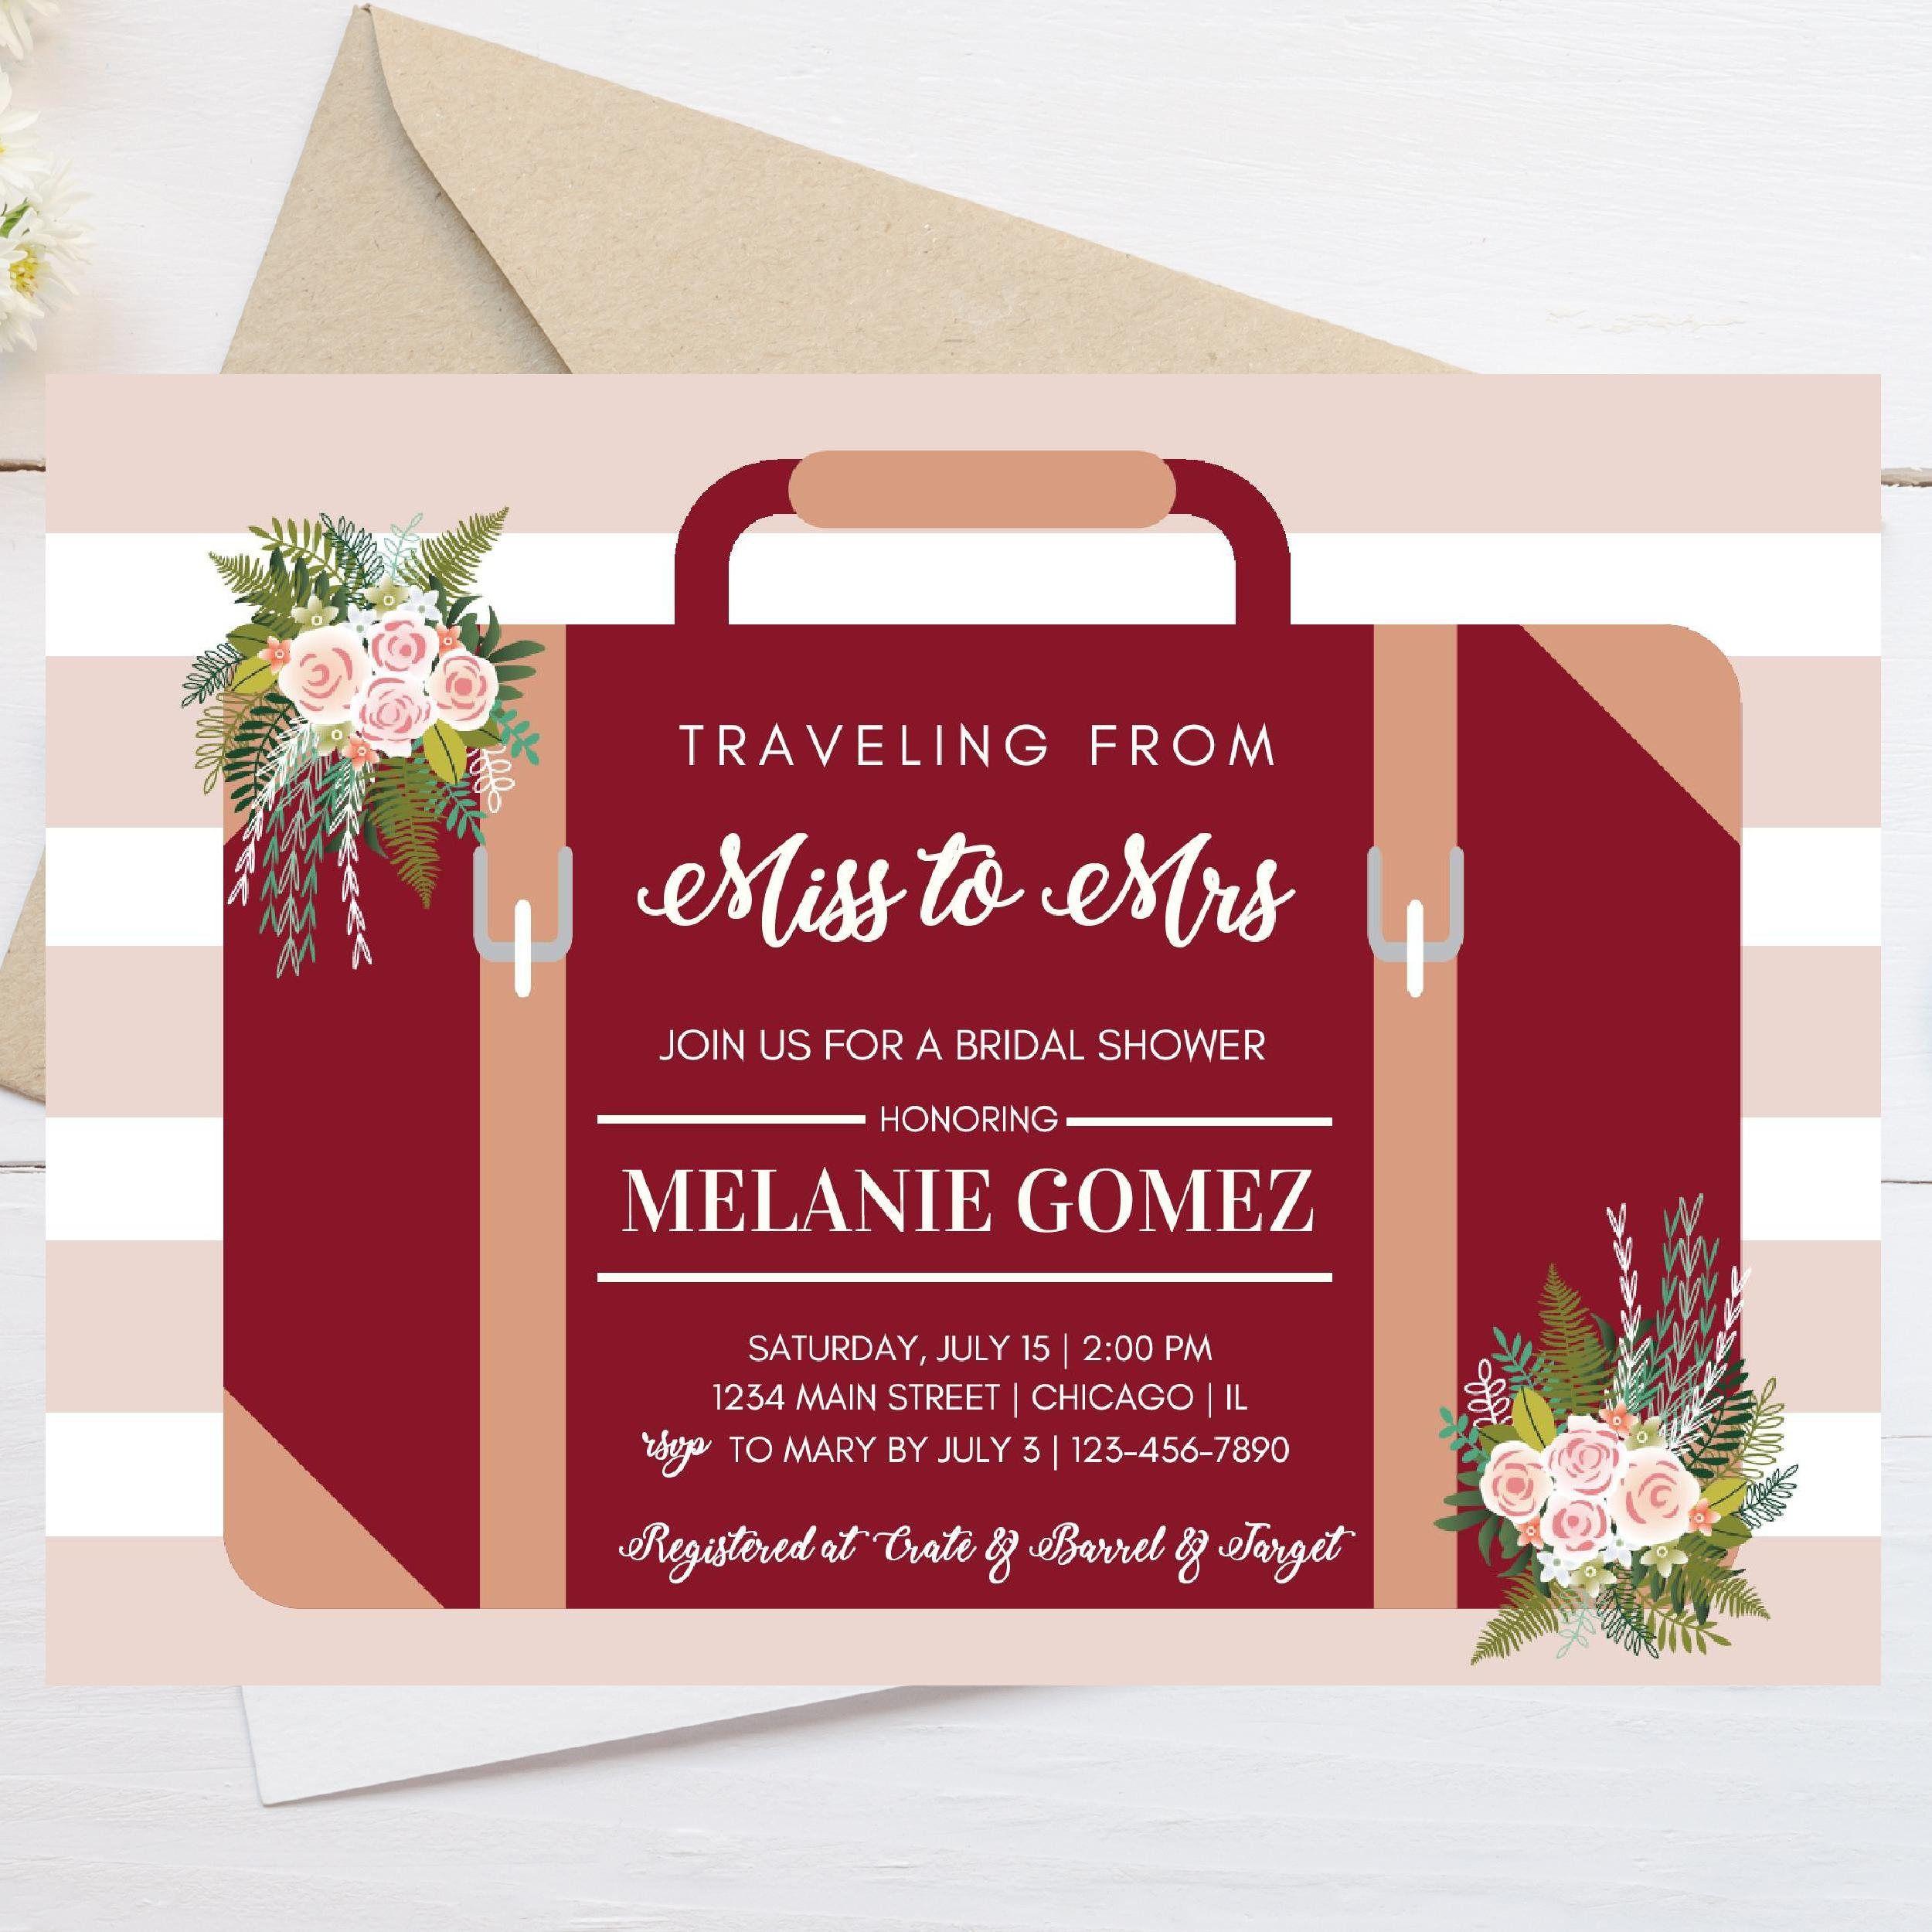 Printable Bridal Shower Invitation, Travel Theme, Travel invitations ...